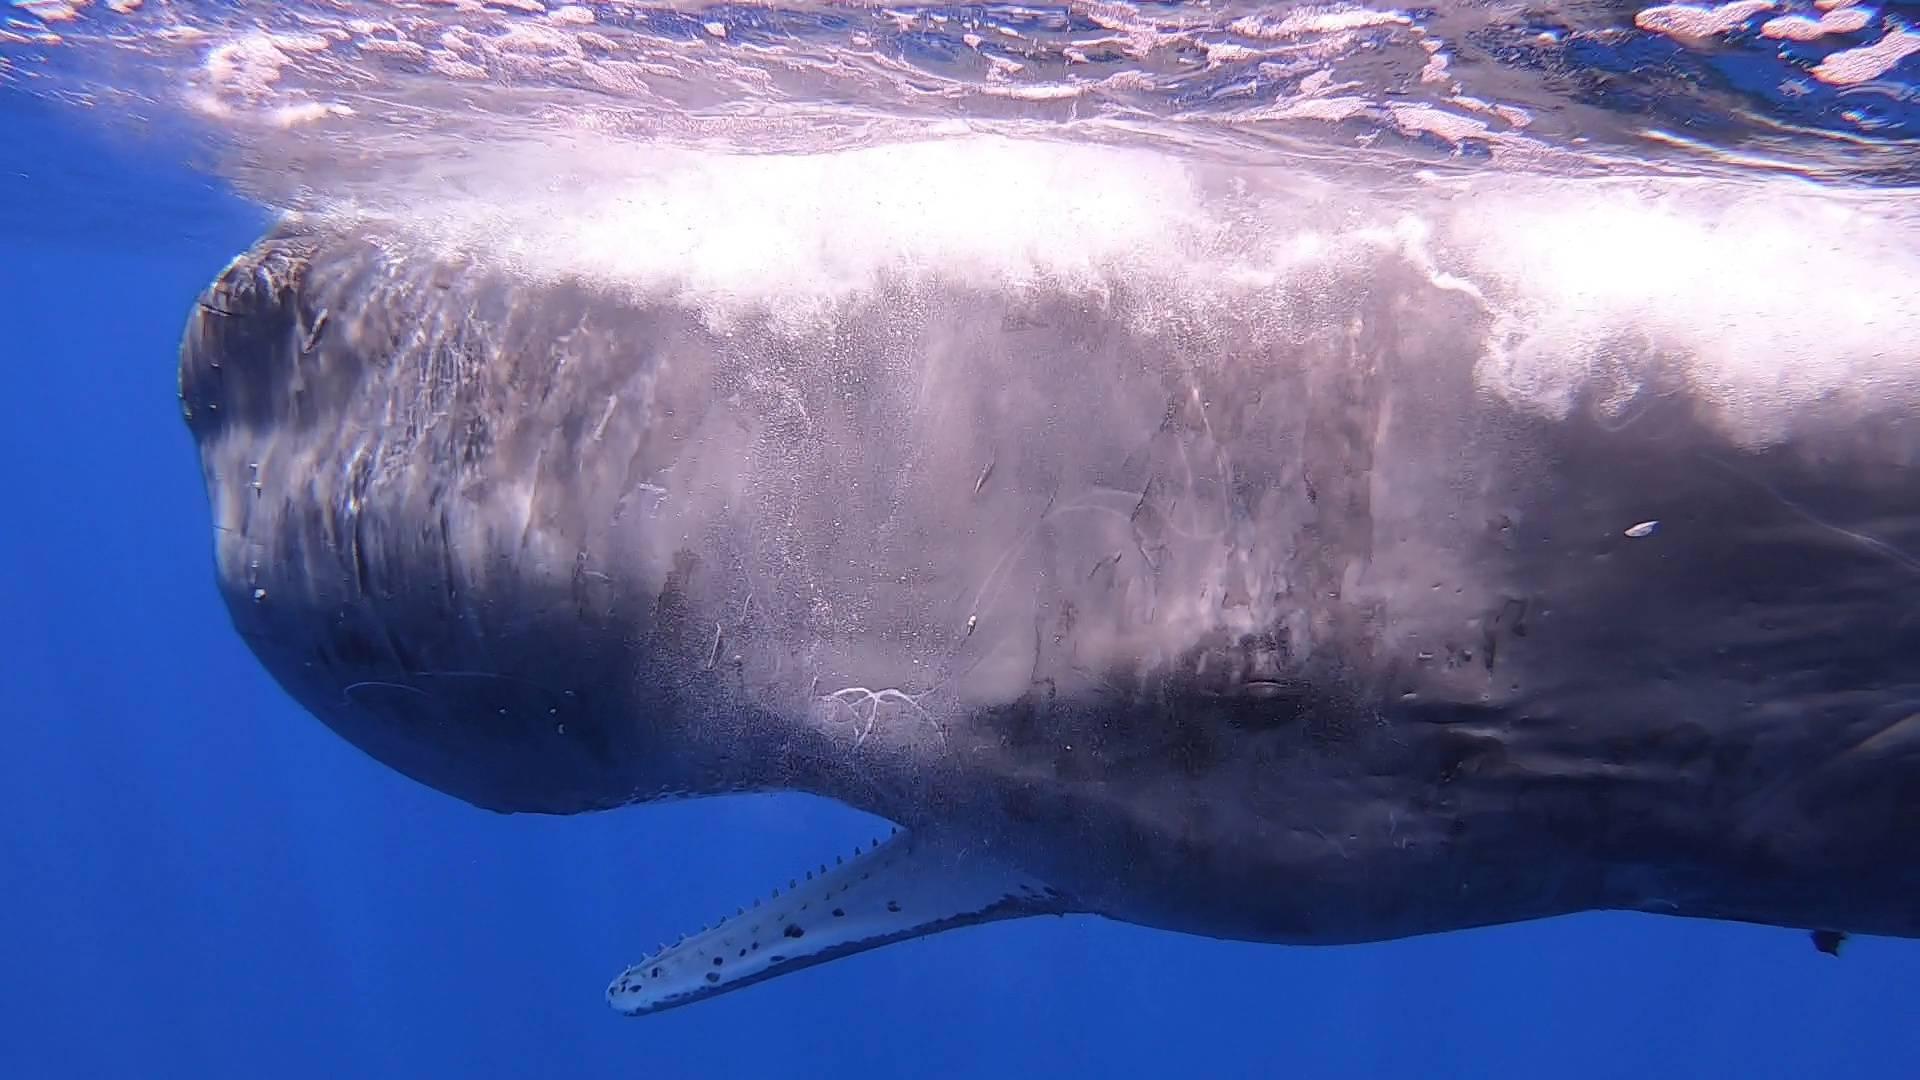 Italian coastguard work to free sperm whale entangled in fishing net